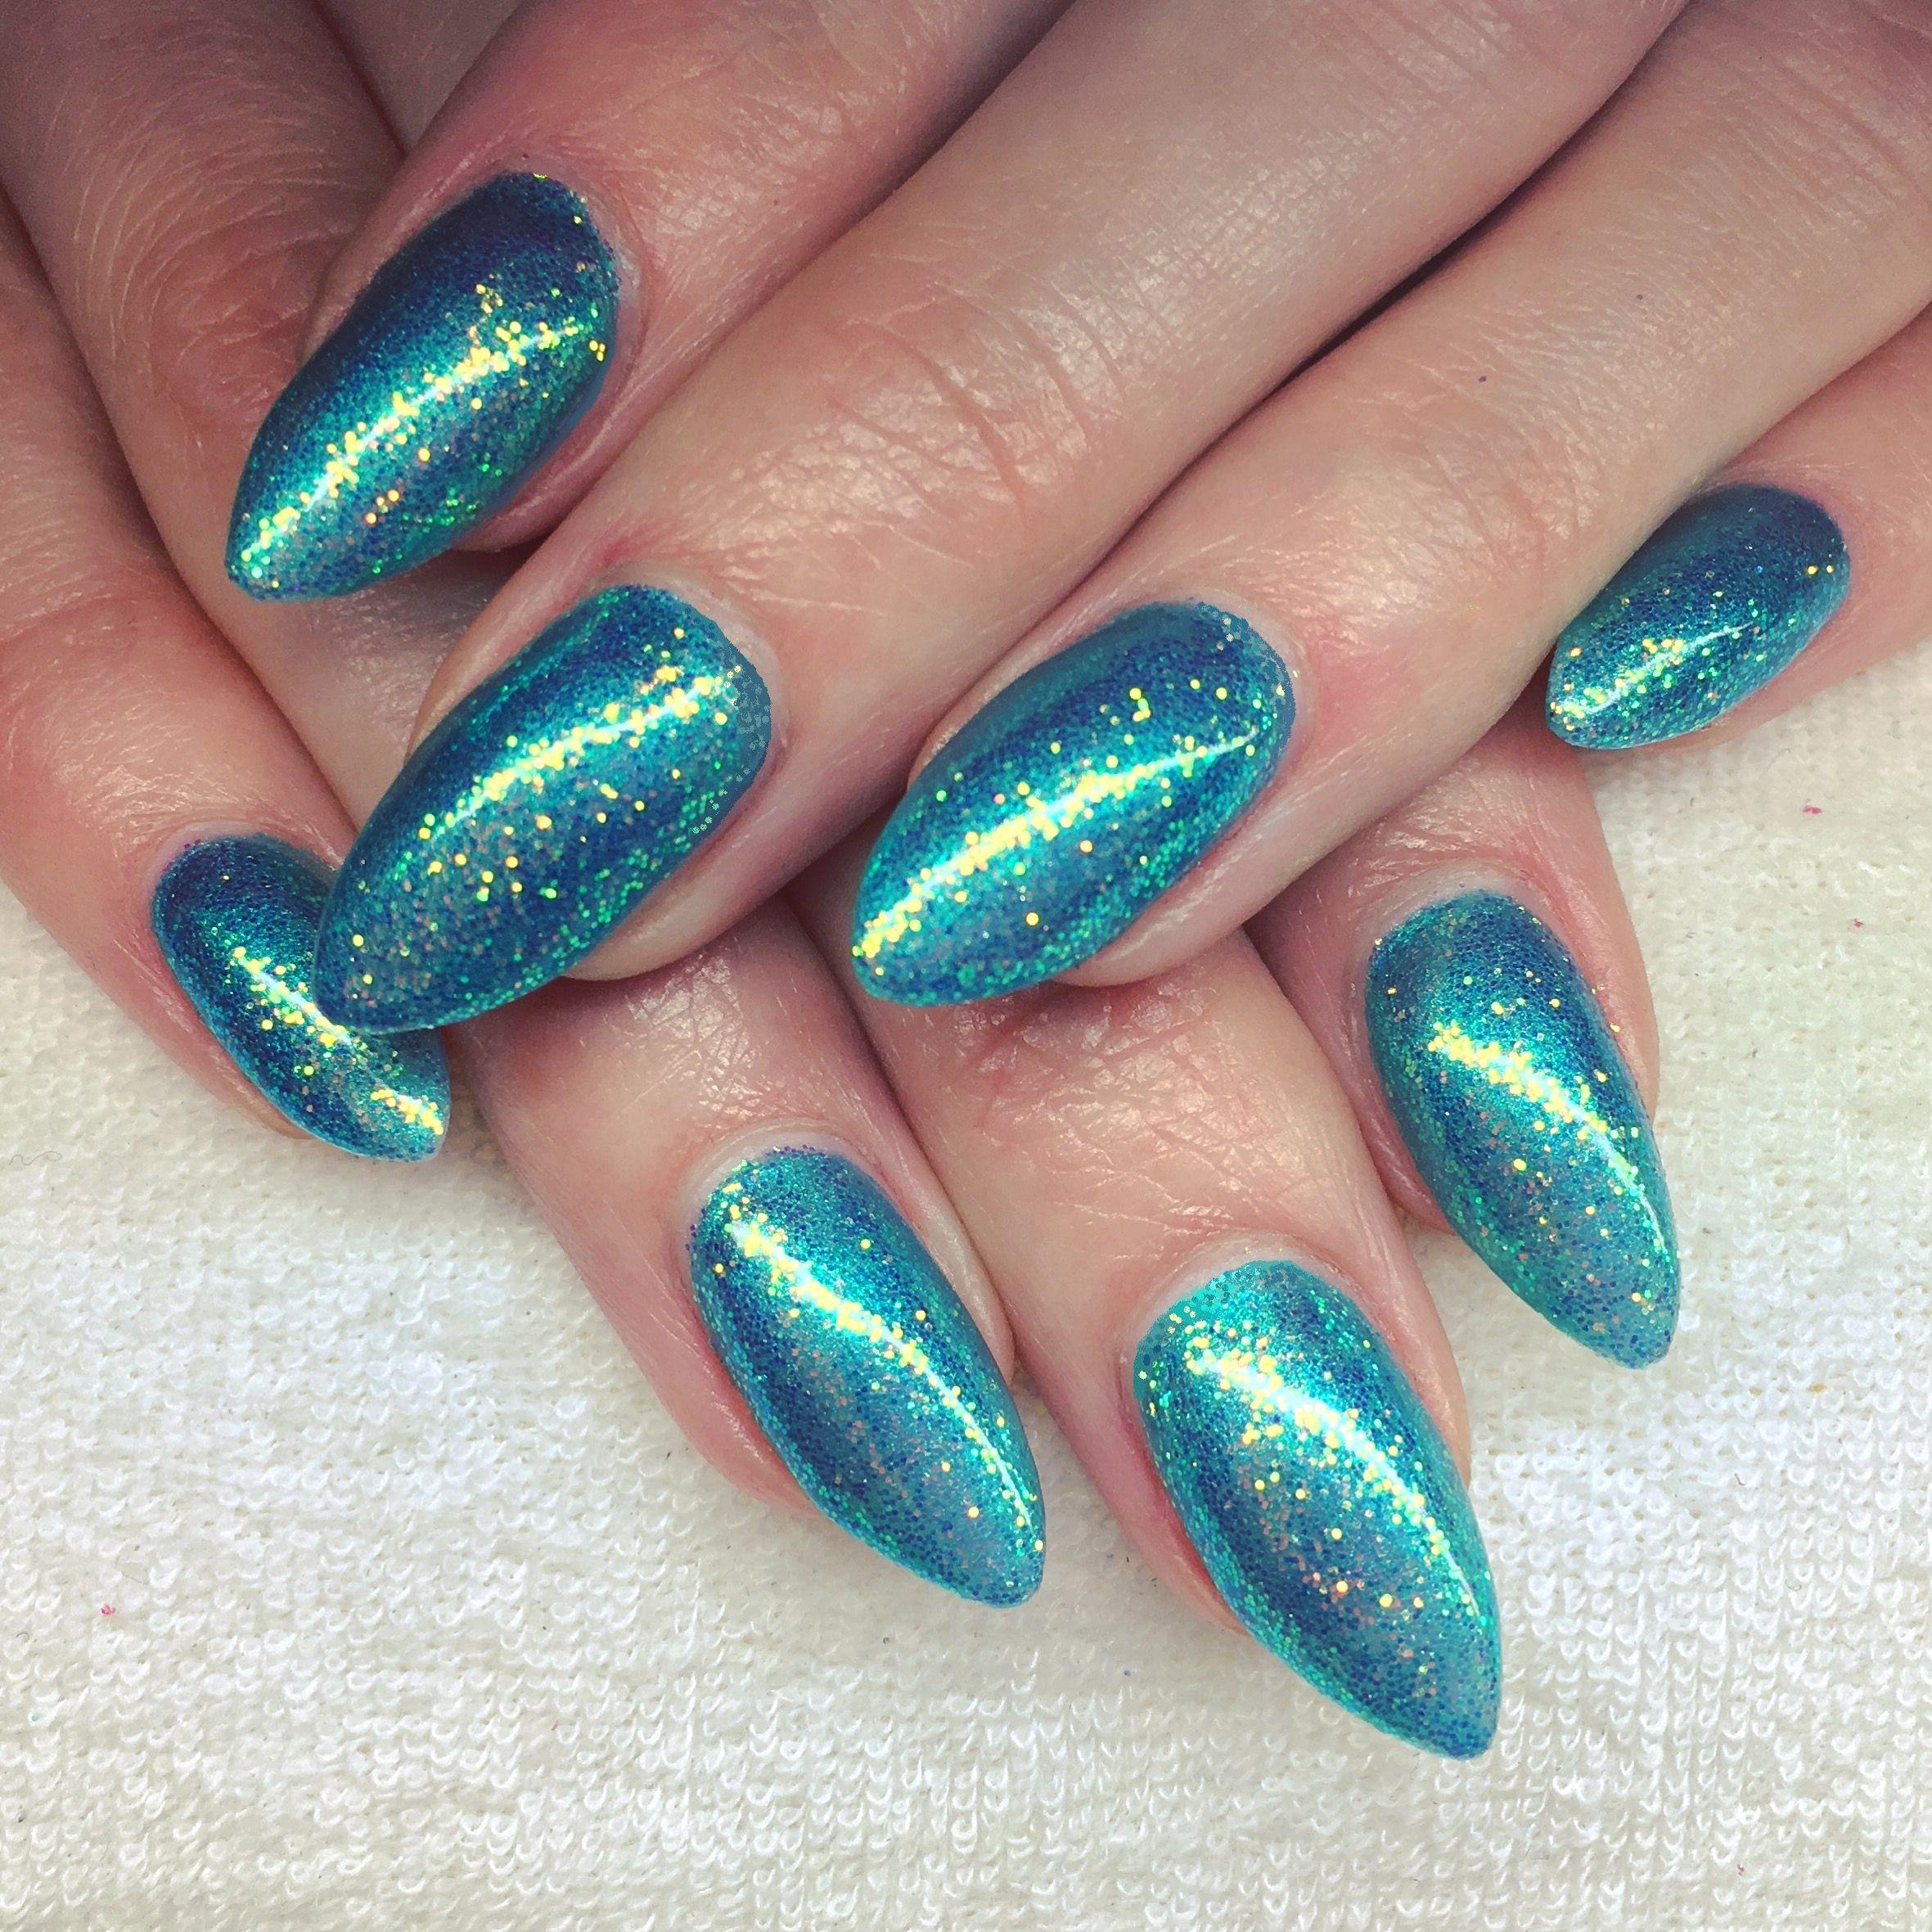 CND Shellac Hotski to Tchotchke and Lecente Capri Glitter | nails ...